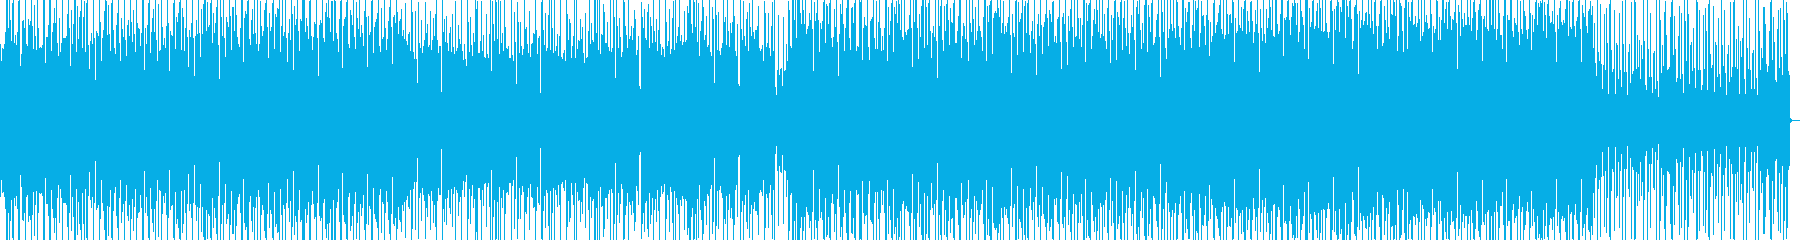 Simple, fashionable, electro BGM's reproduced waveform